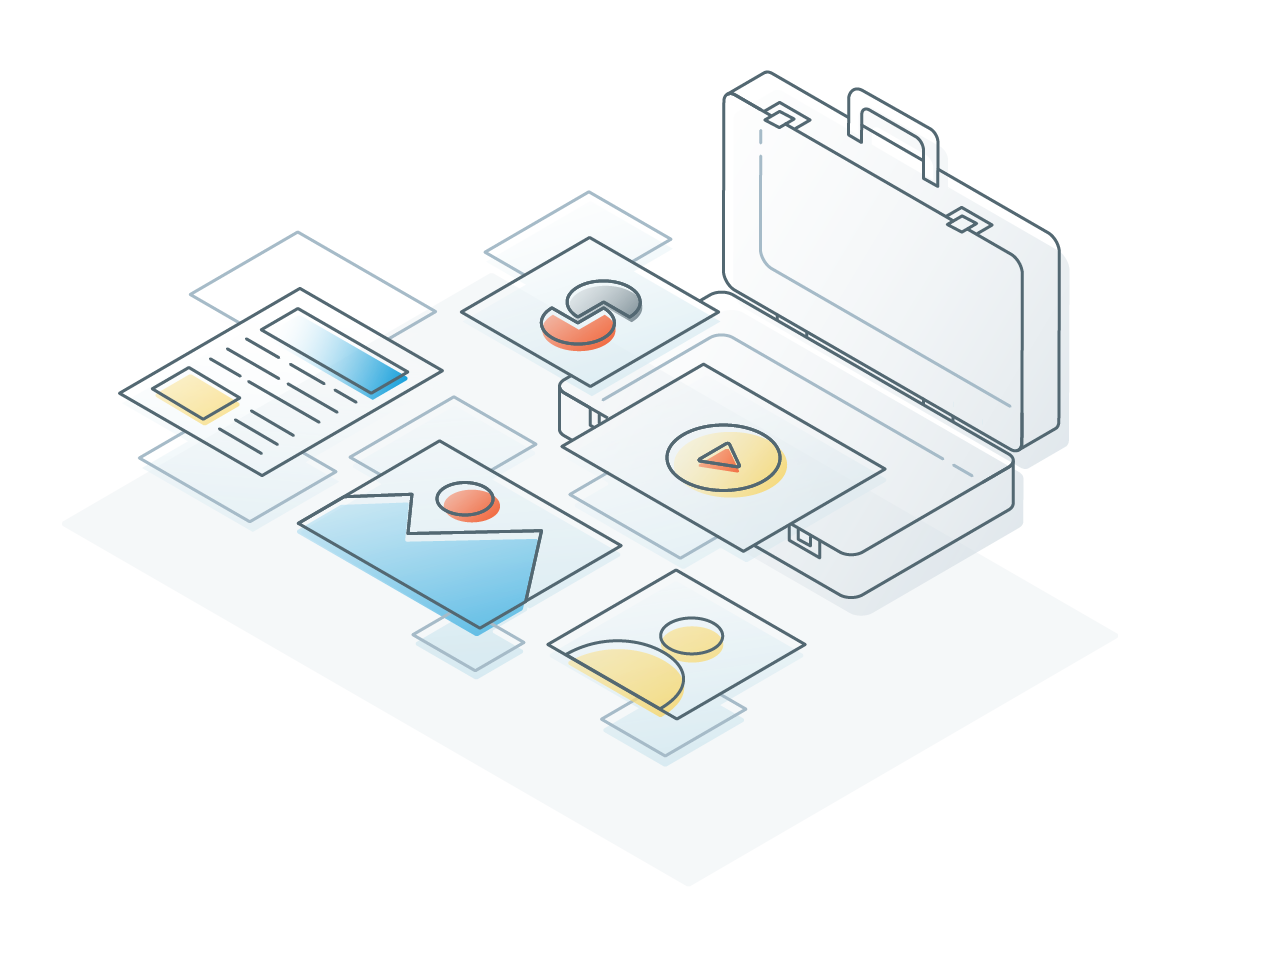 Media-Kit-Illustration